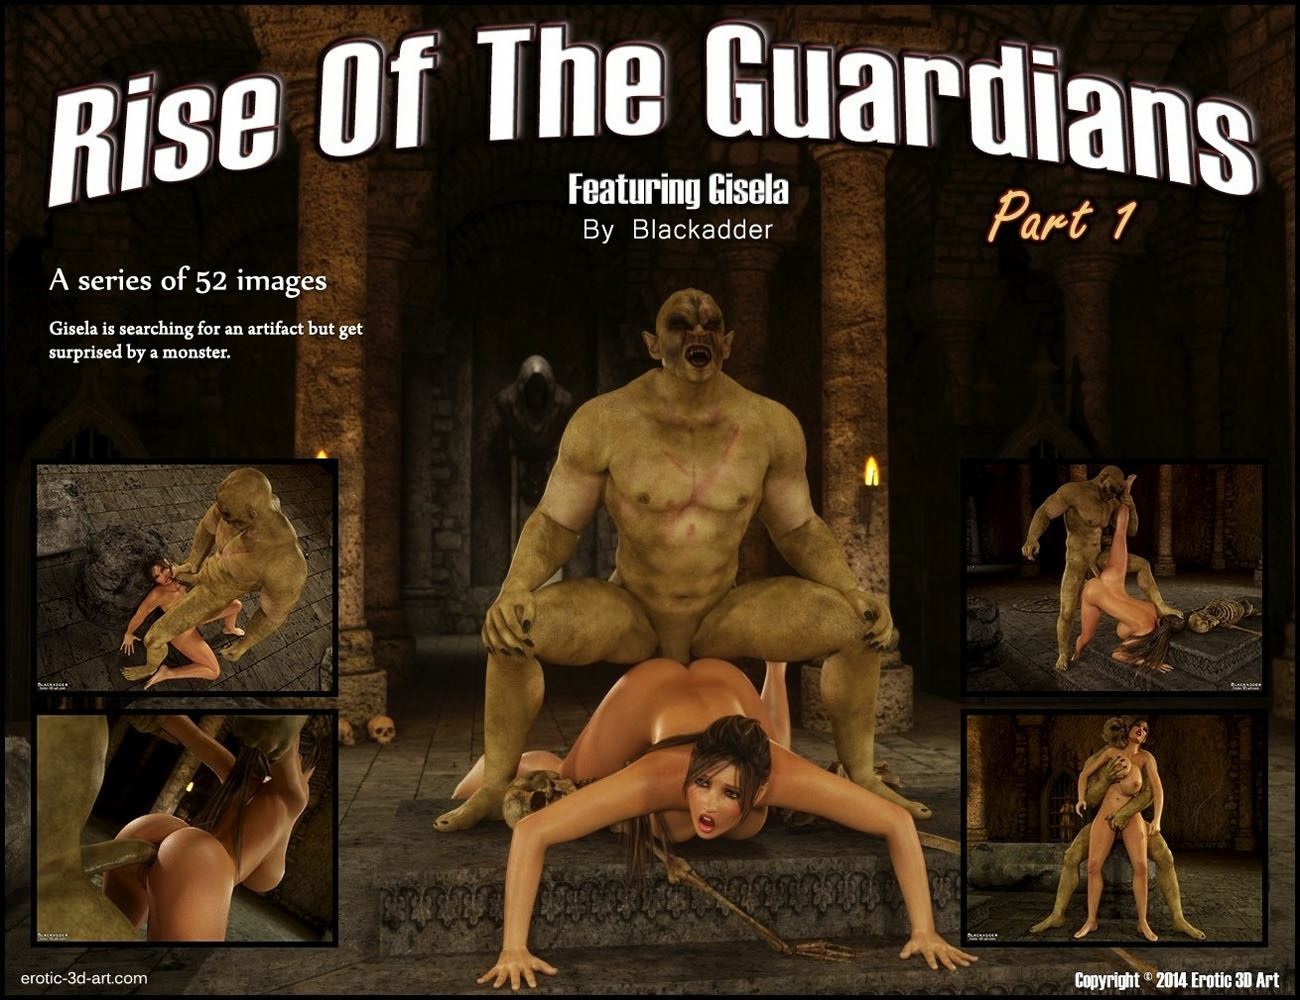 Rise Of the Guardians- Blackadder image 1